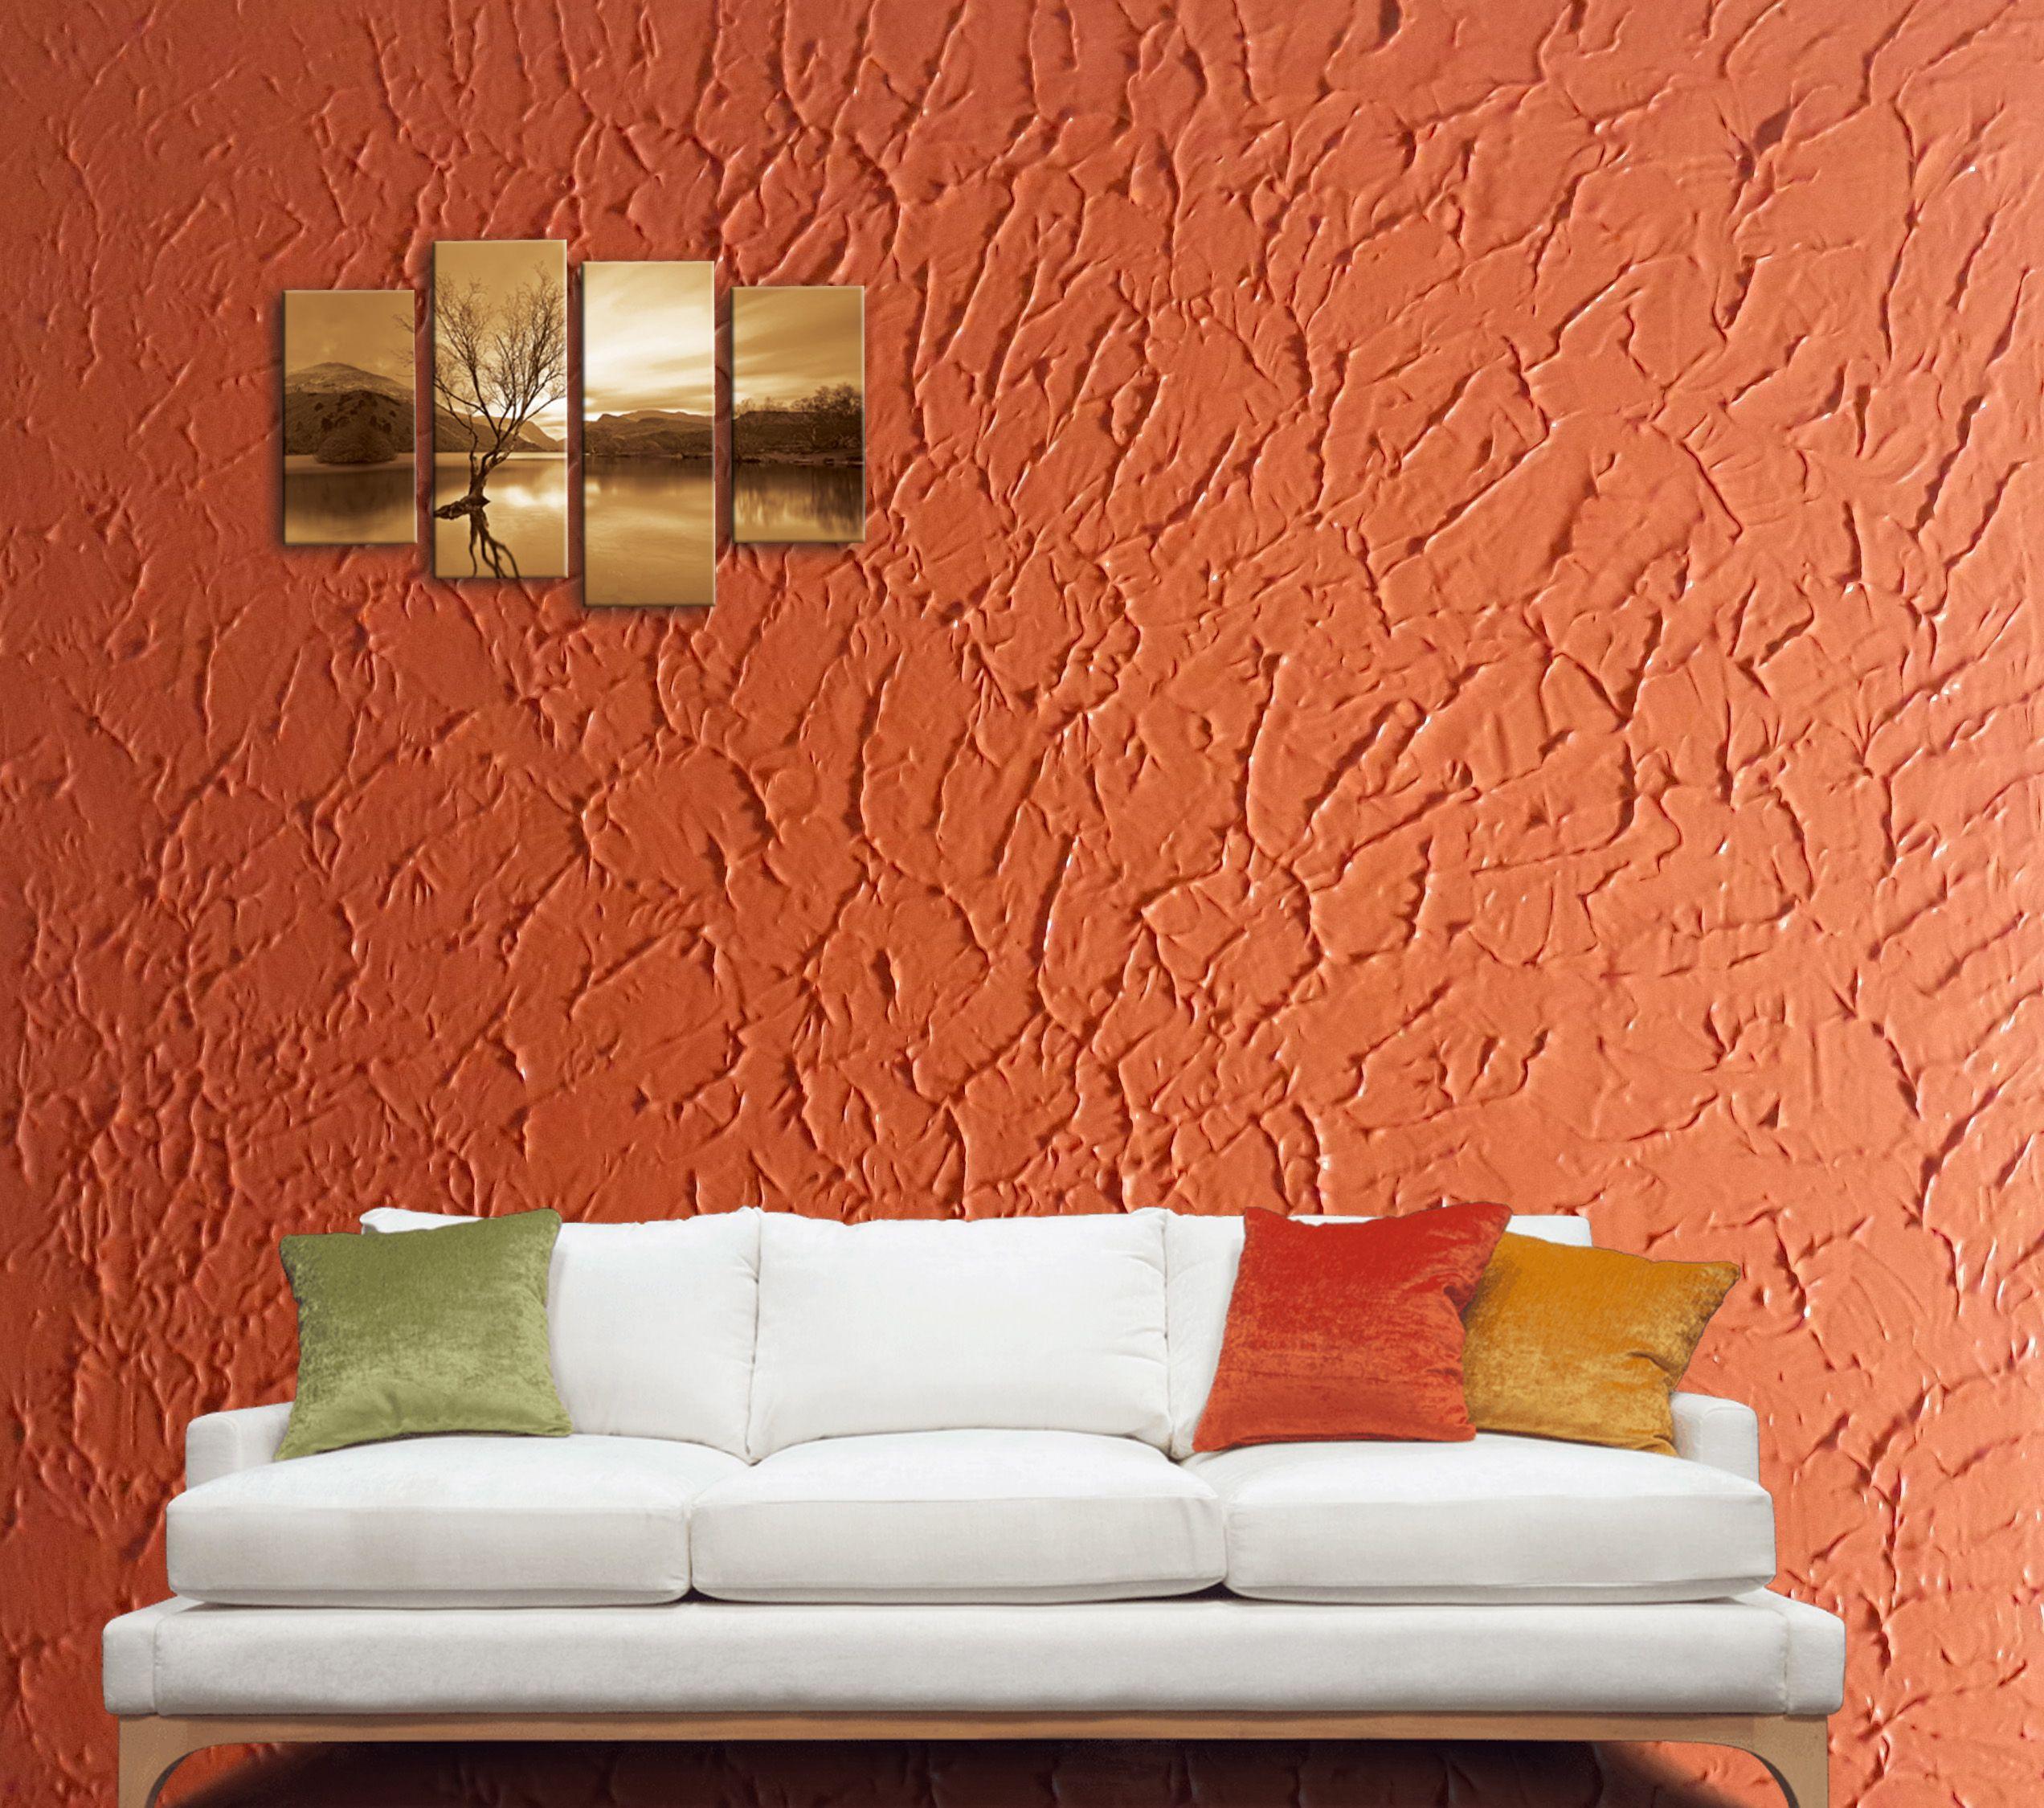 Decorative Texture On Dry Wall Wall Texture Design Asian Paint Design Pop False Ceiling Design